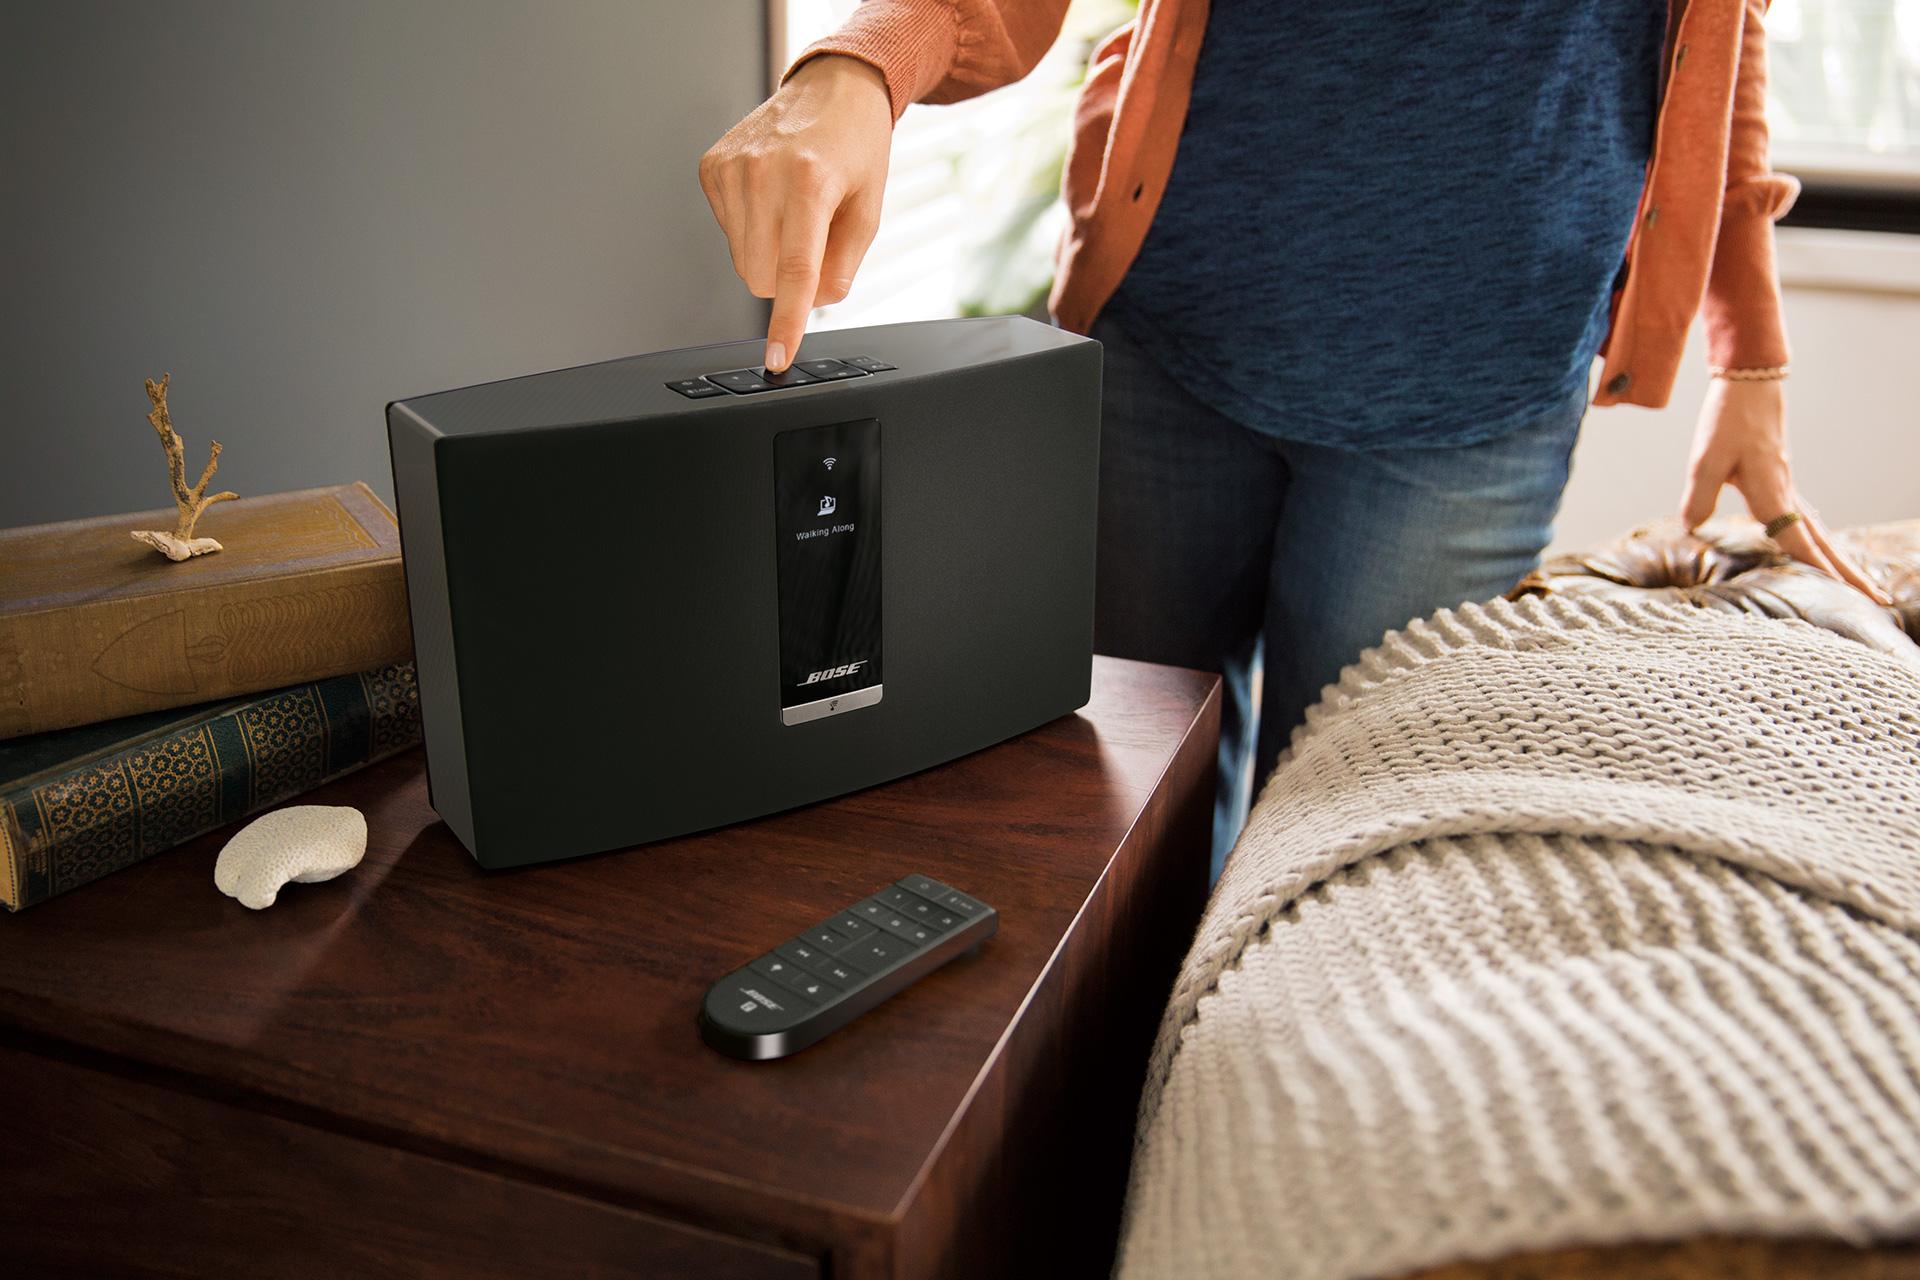 les enceintes sans fil multiroom bose soundtouch 10 20. Black Bedroom Furniture Sets. Home Design Ideas